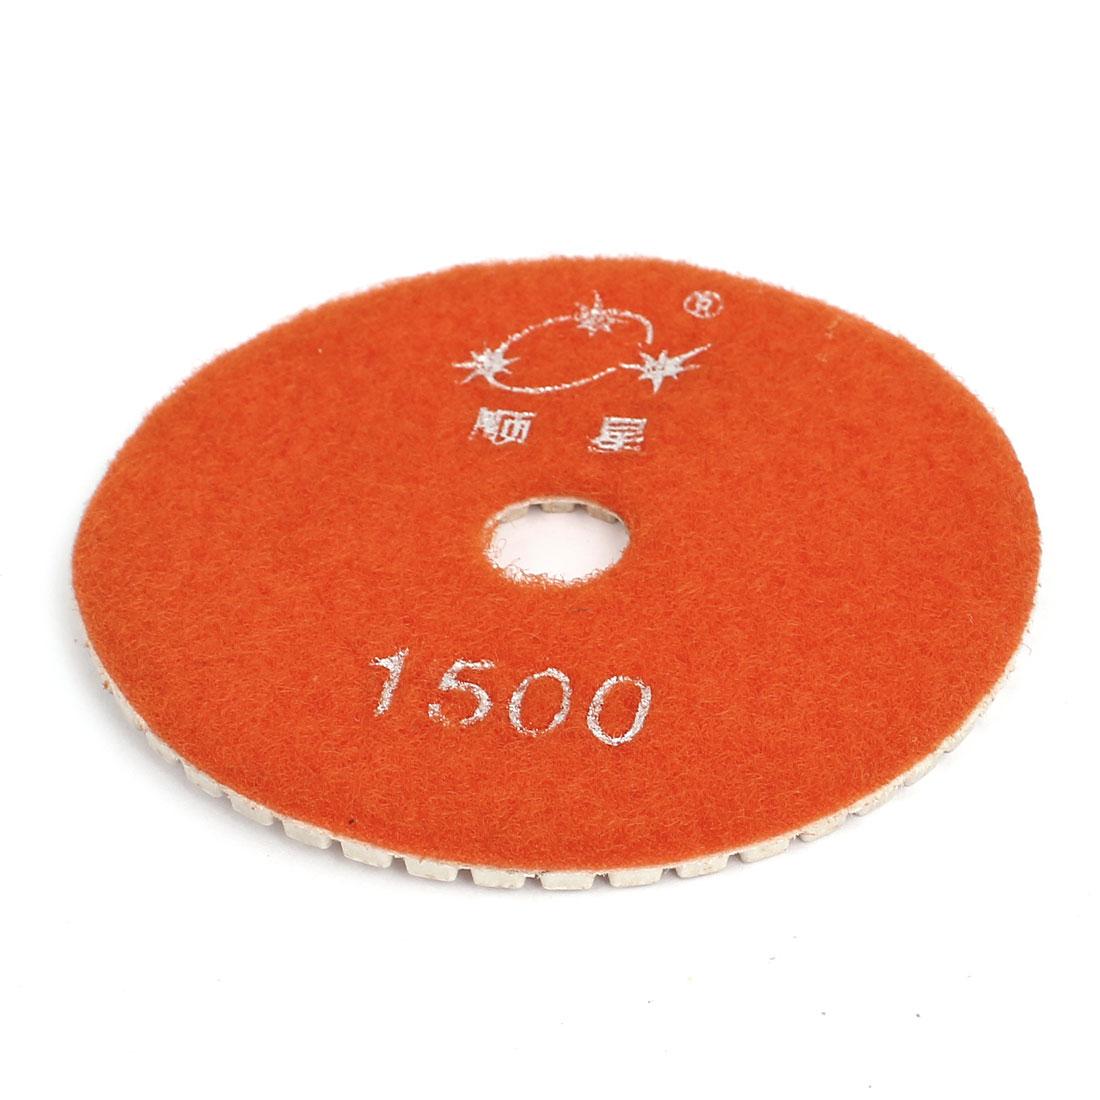 100mmx16mm Wet Diamond Polishing Pad Polisher 1500 Grit for Marble Granite